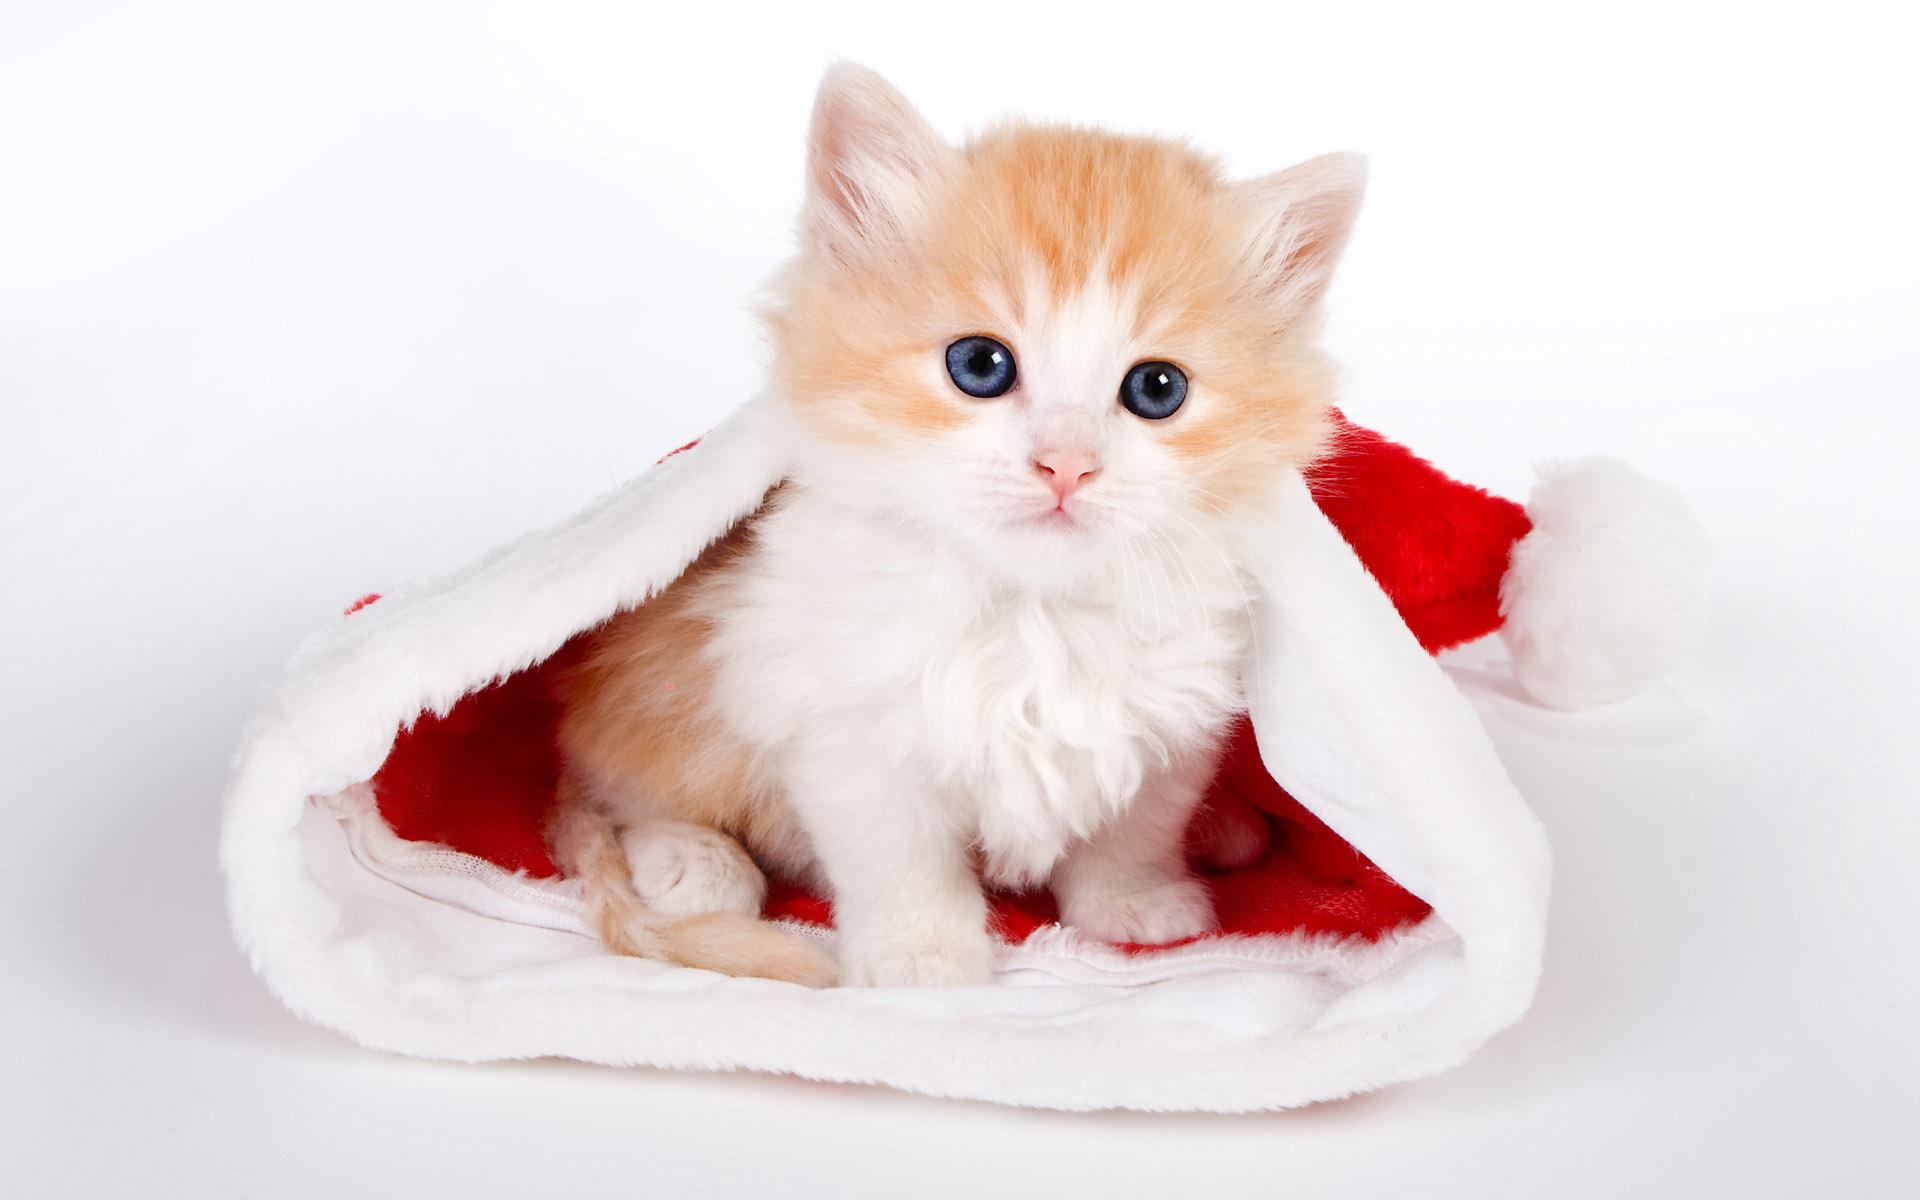 Cute Baby Cat Wallpaper Hd Desktop Wallpapers 4k Hd